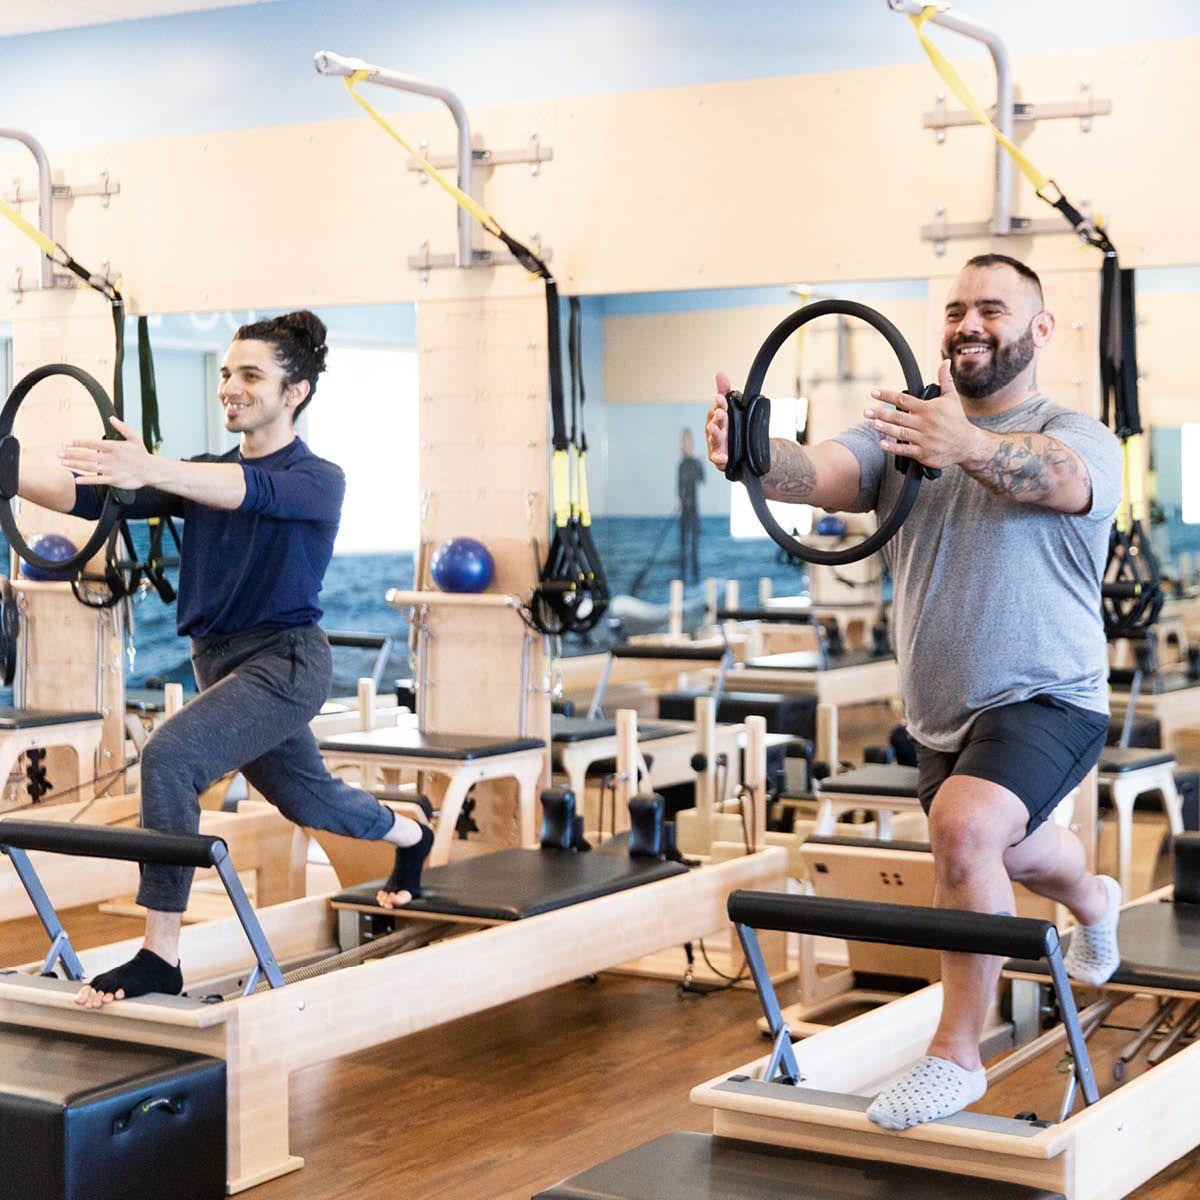 Club Pilates Ranks in Entrepreneur's 2021 Fastest-Growing Franchises